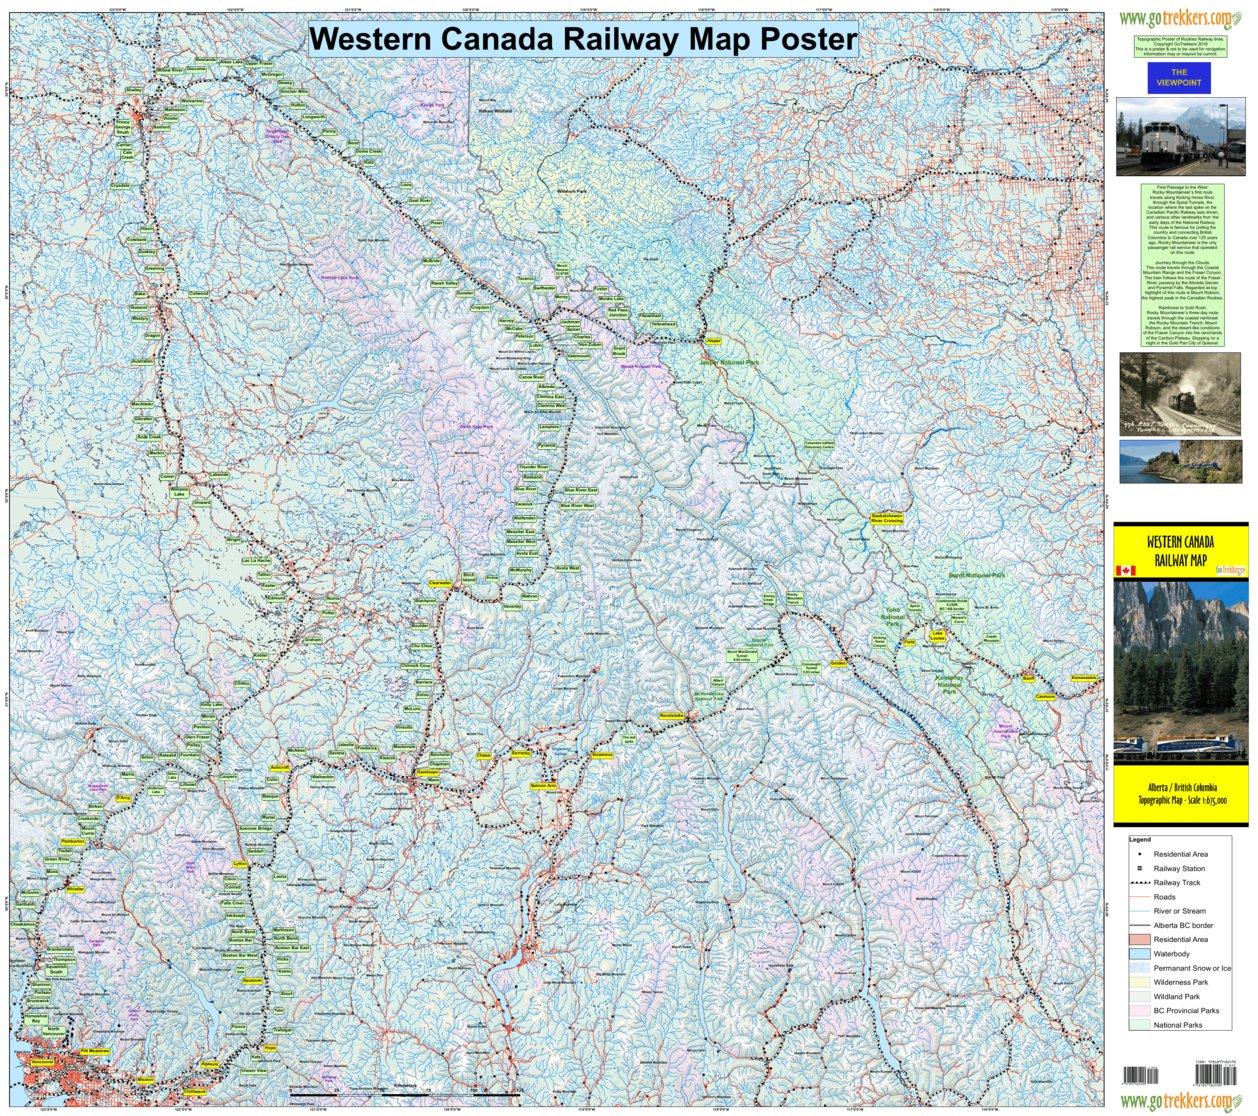 Western Canada Railway Map Gotrekkers Ltd Avenza Maps